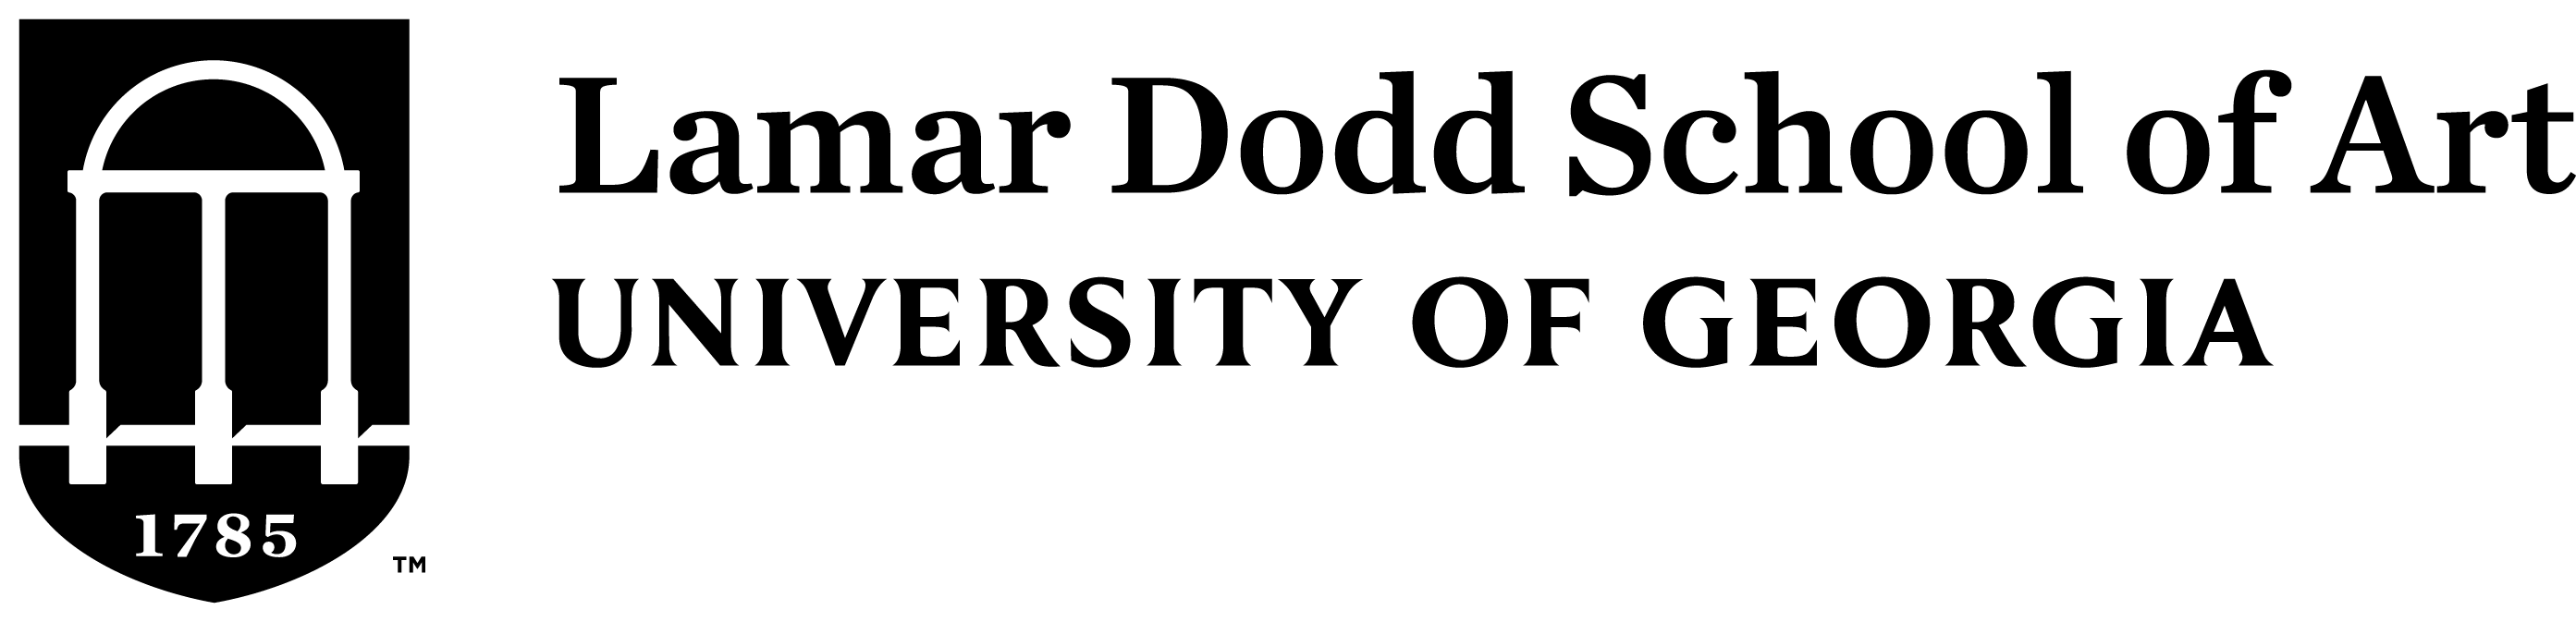 Screen-DODD-H-1CB